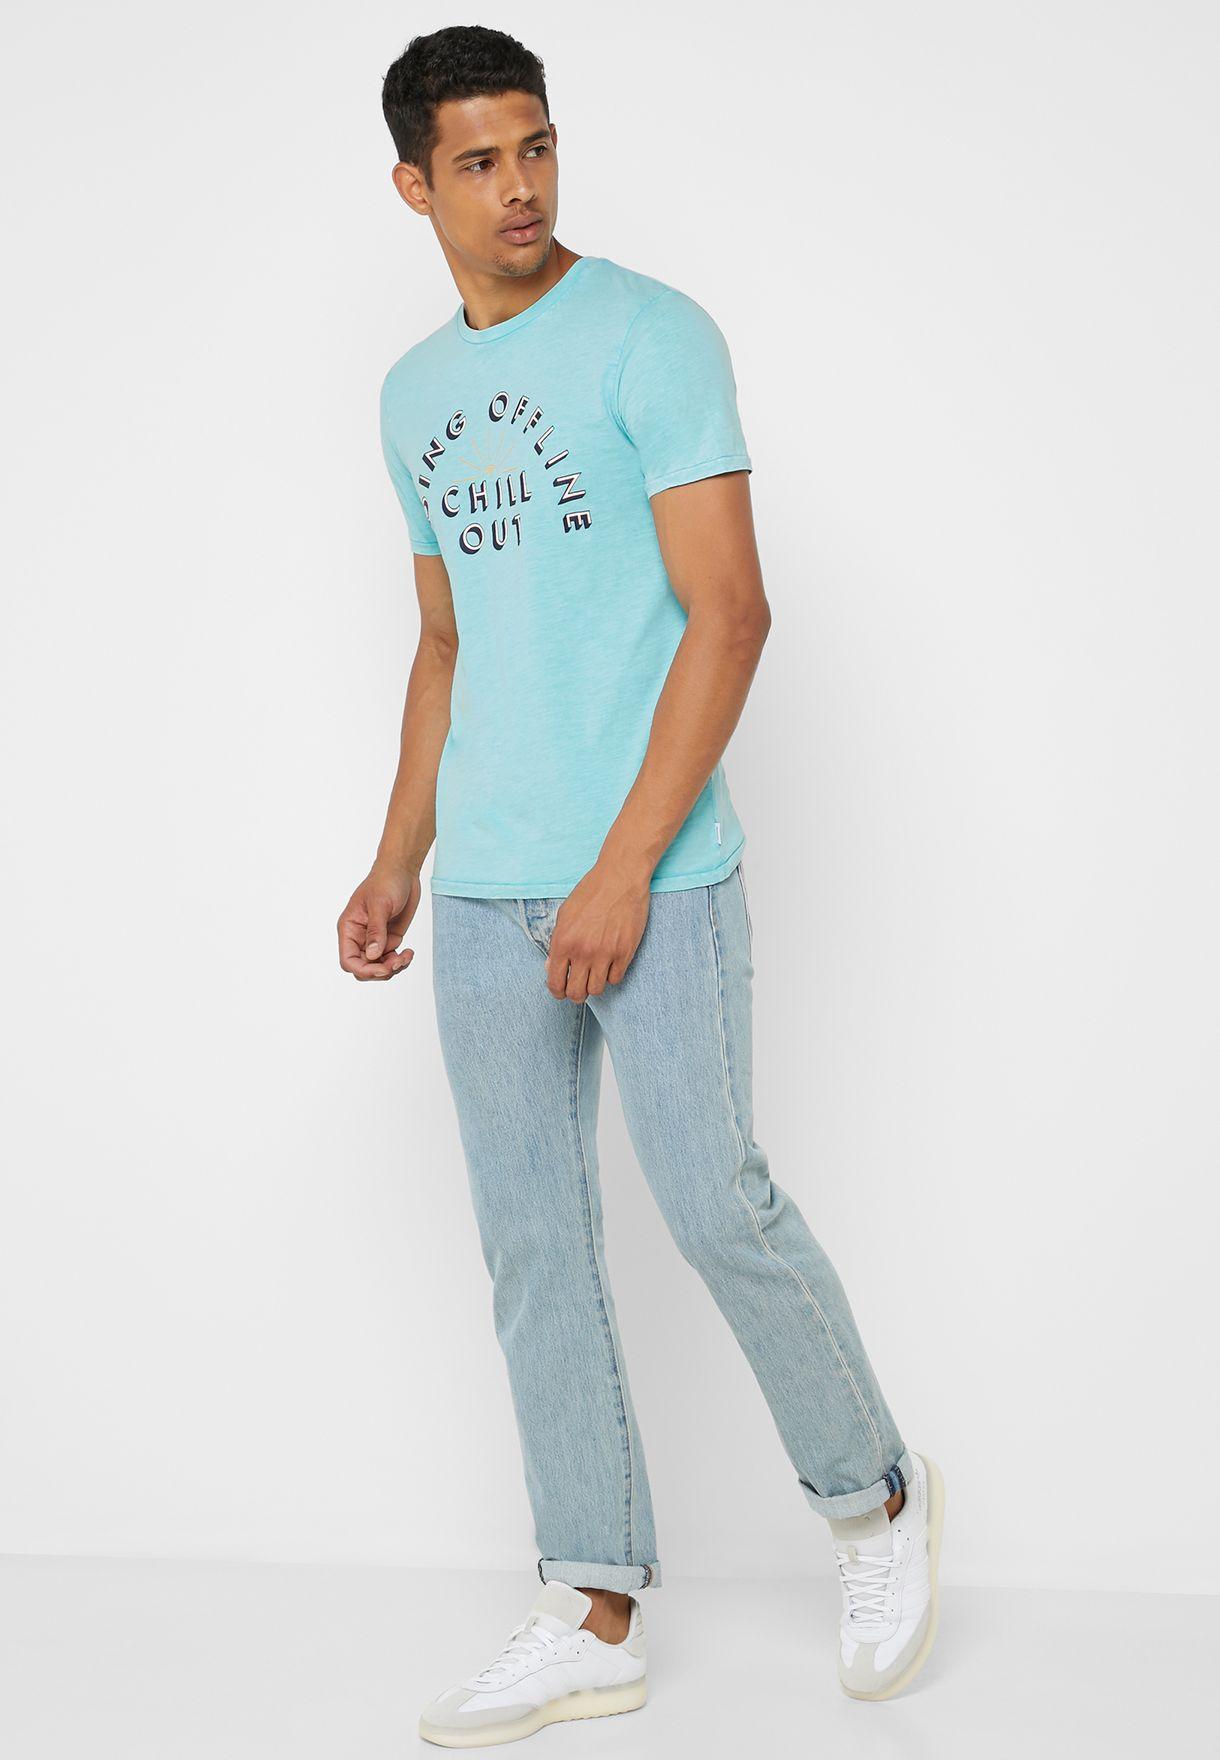 Essential Summer Crew  Neck T-Shirt